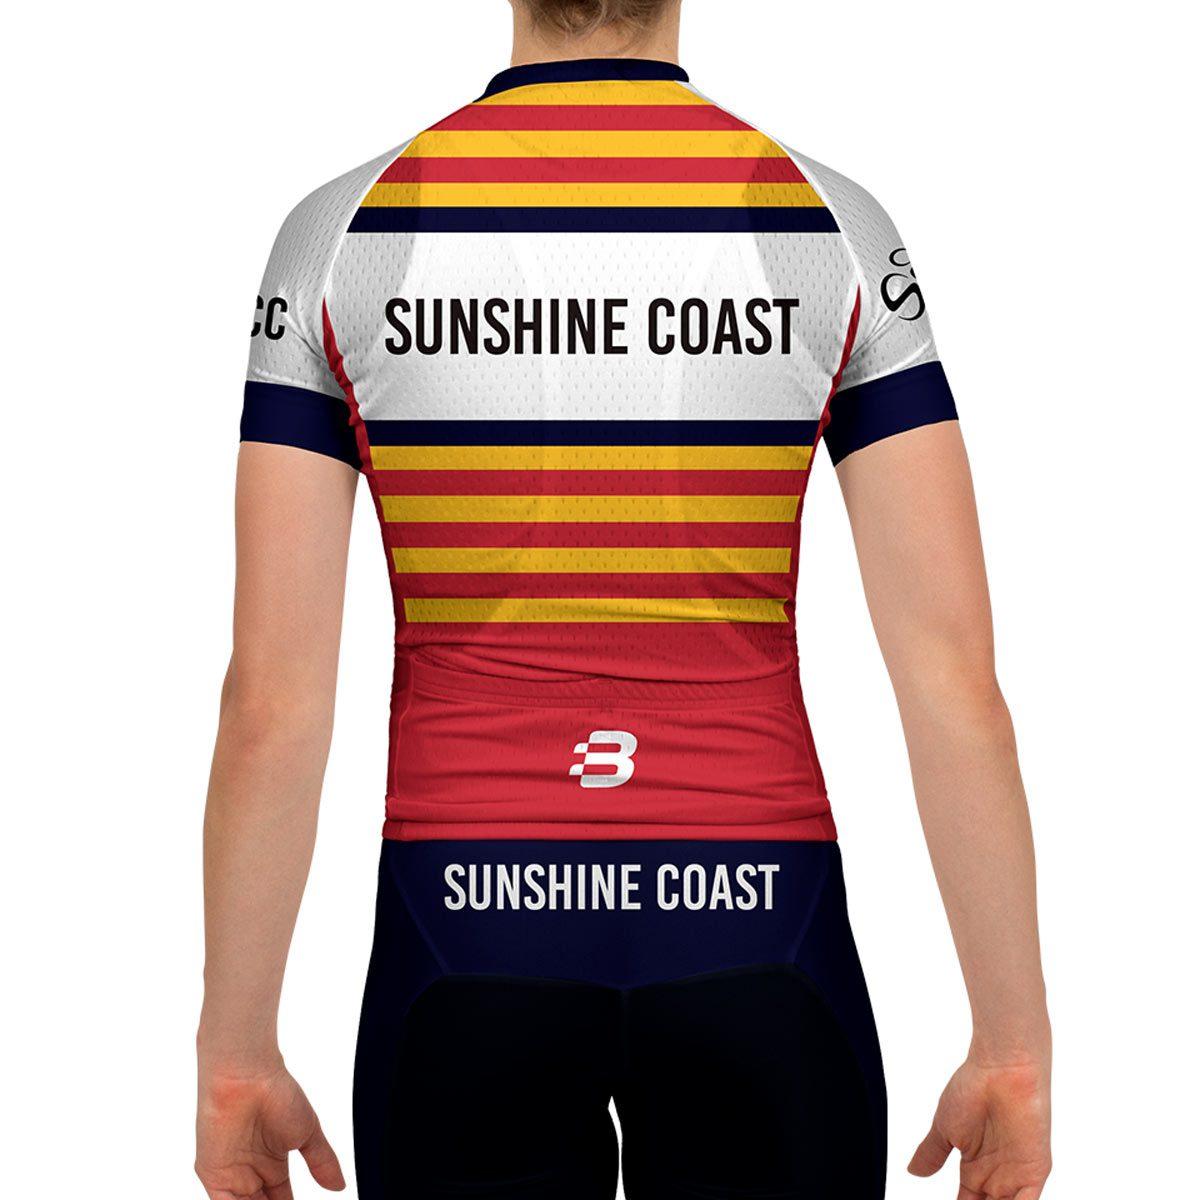 Ladies pro fit jersey sunshine coast cycling club pre for Fishing sponsor shirts